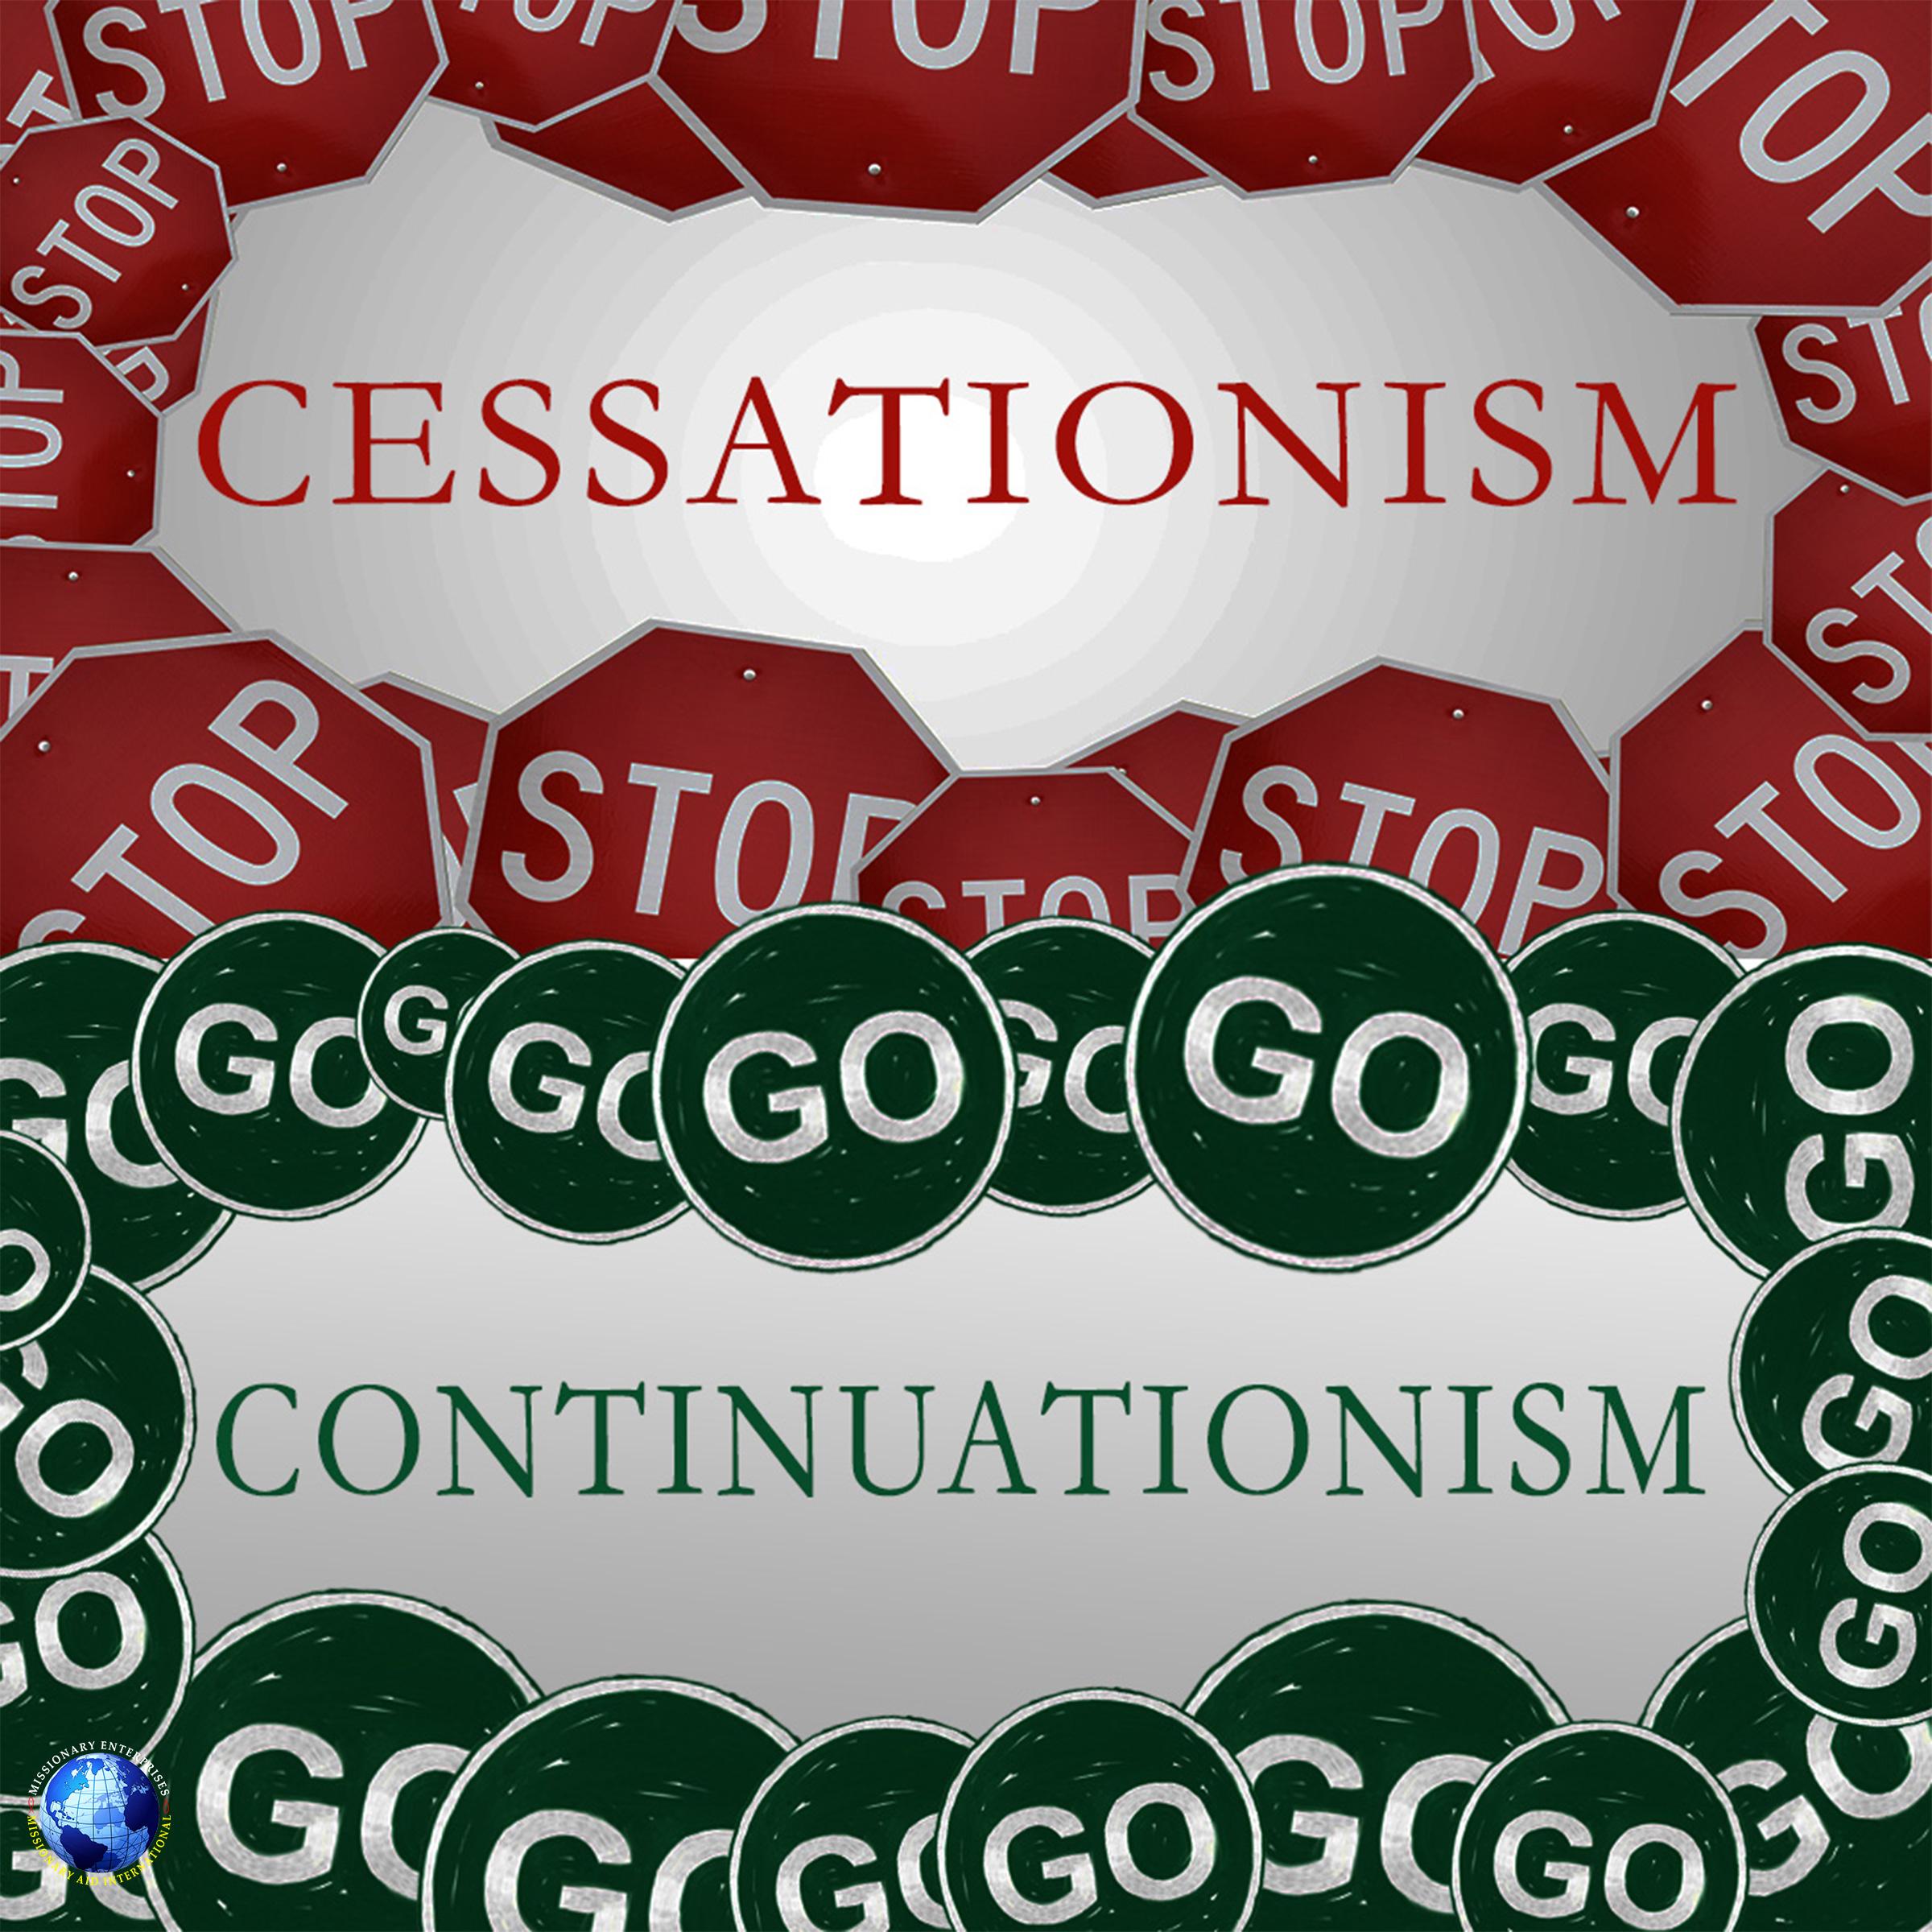 Cessationism – Continuationism